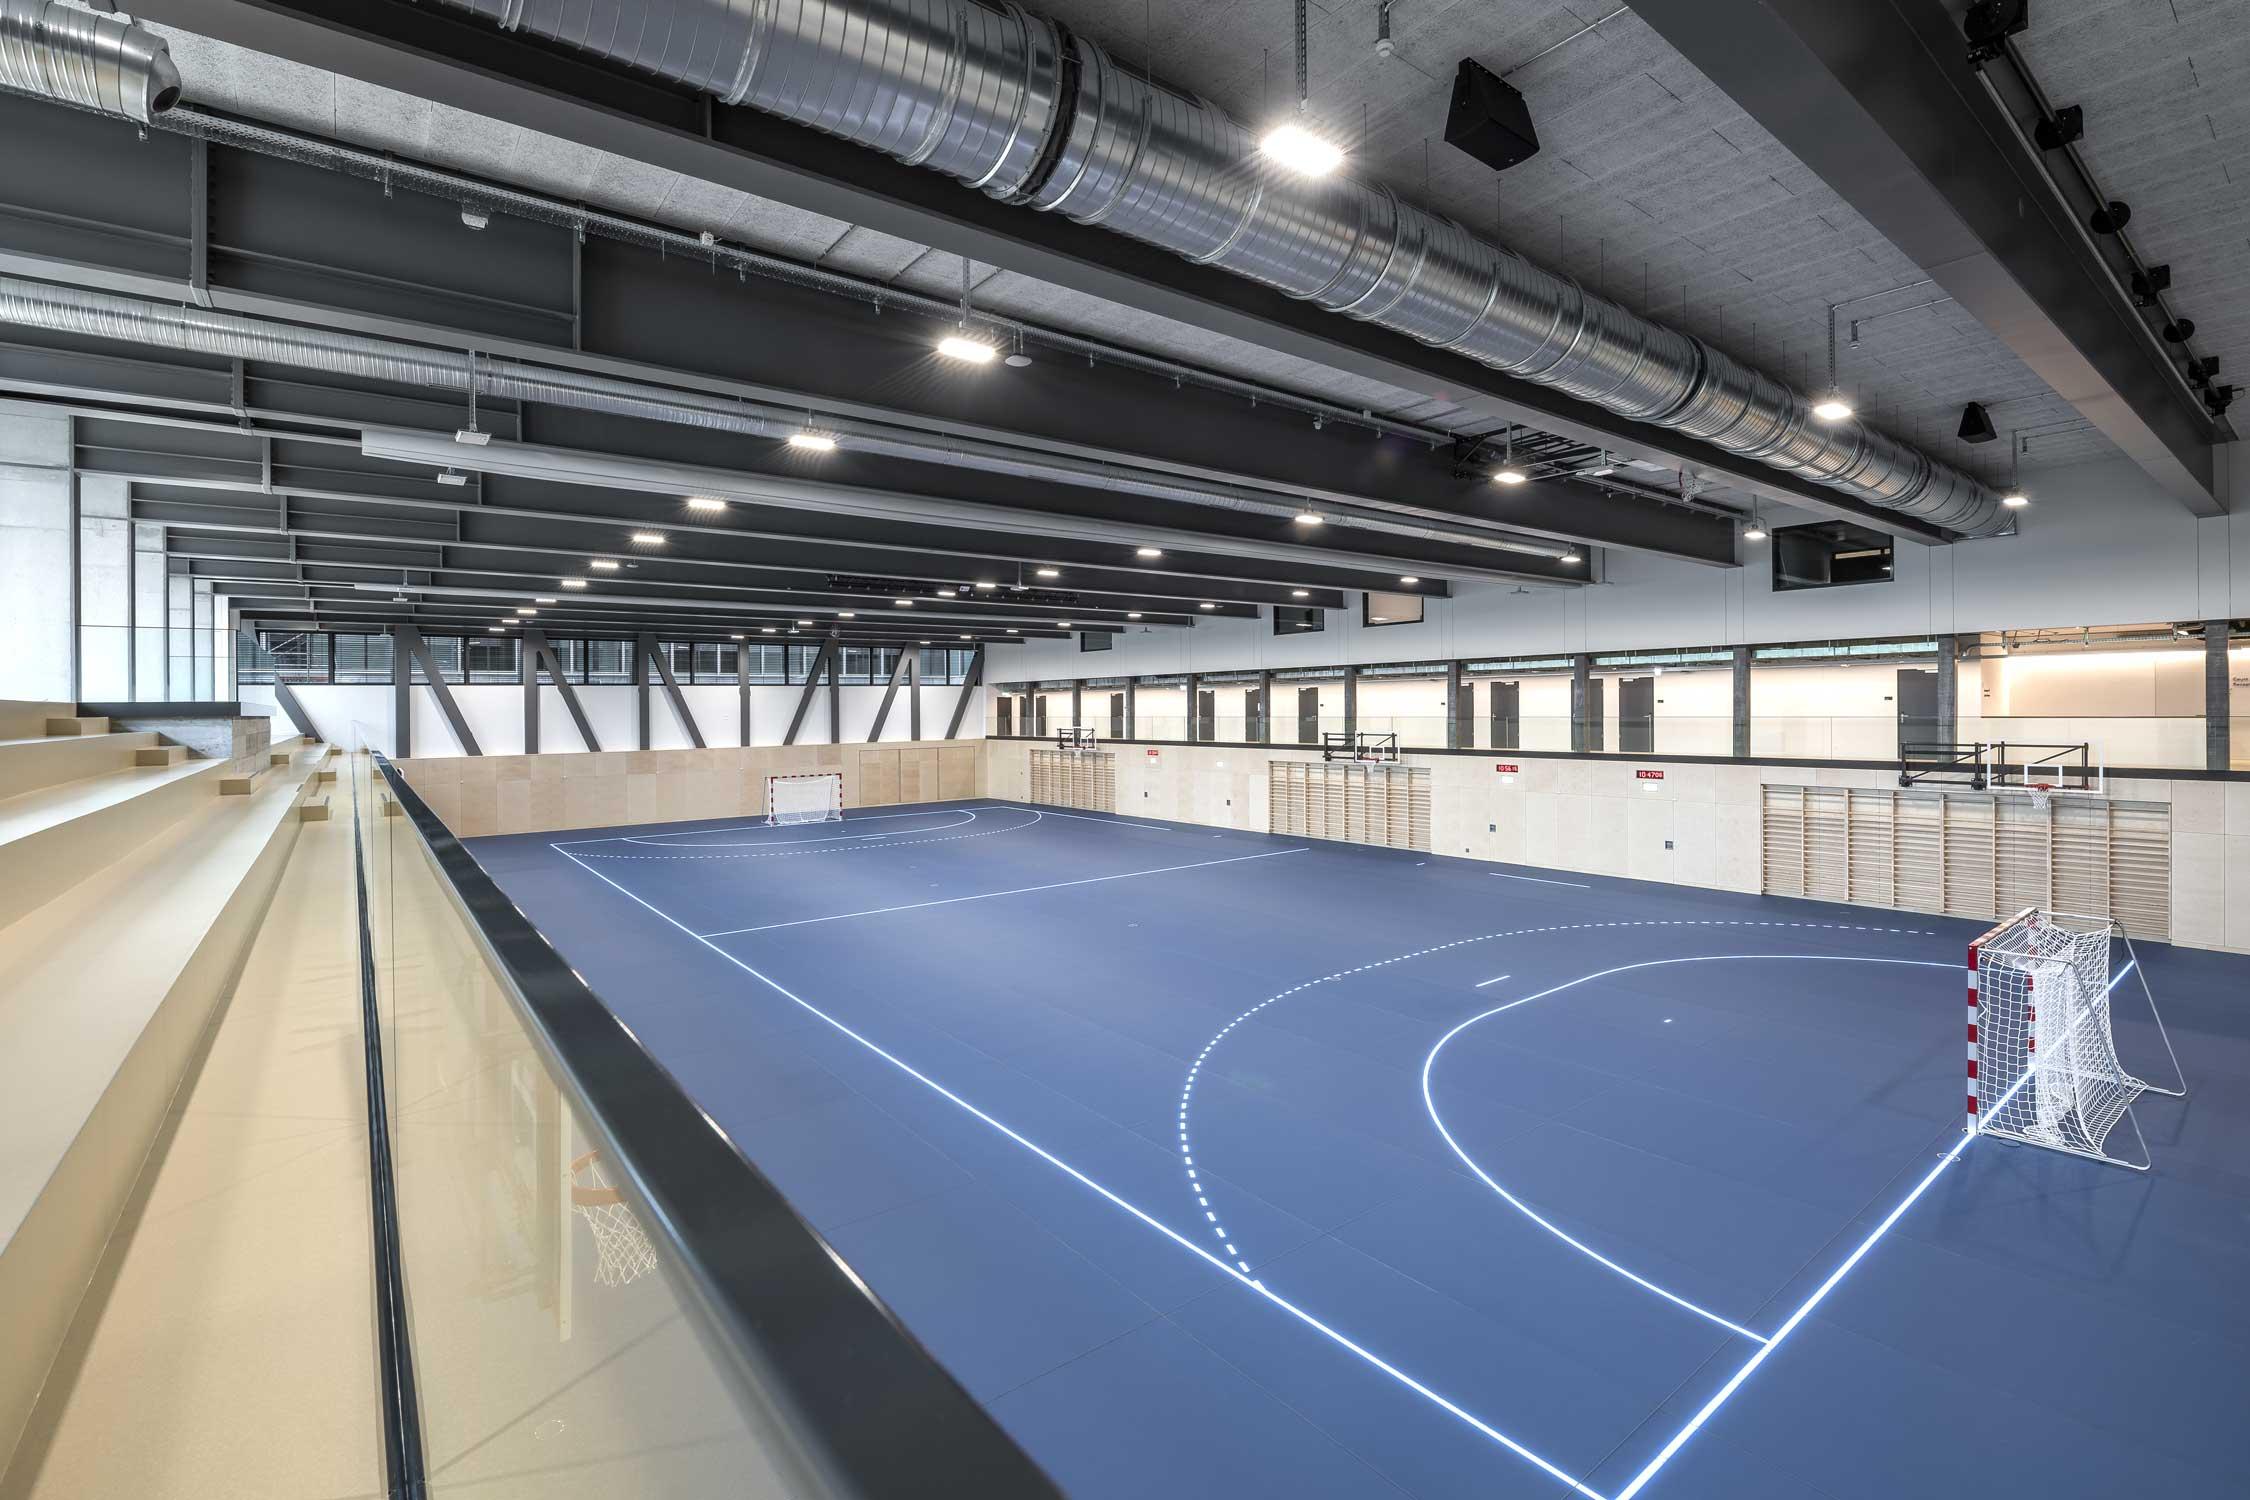 OYM Sporthalle Innenaufnahme Architekturfotografie Regine Giesecke